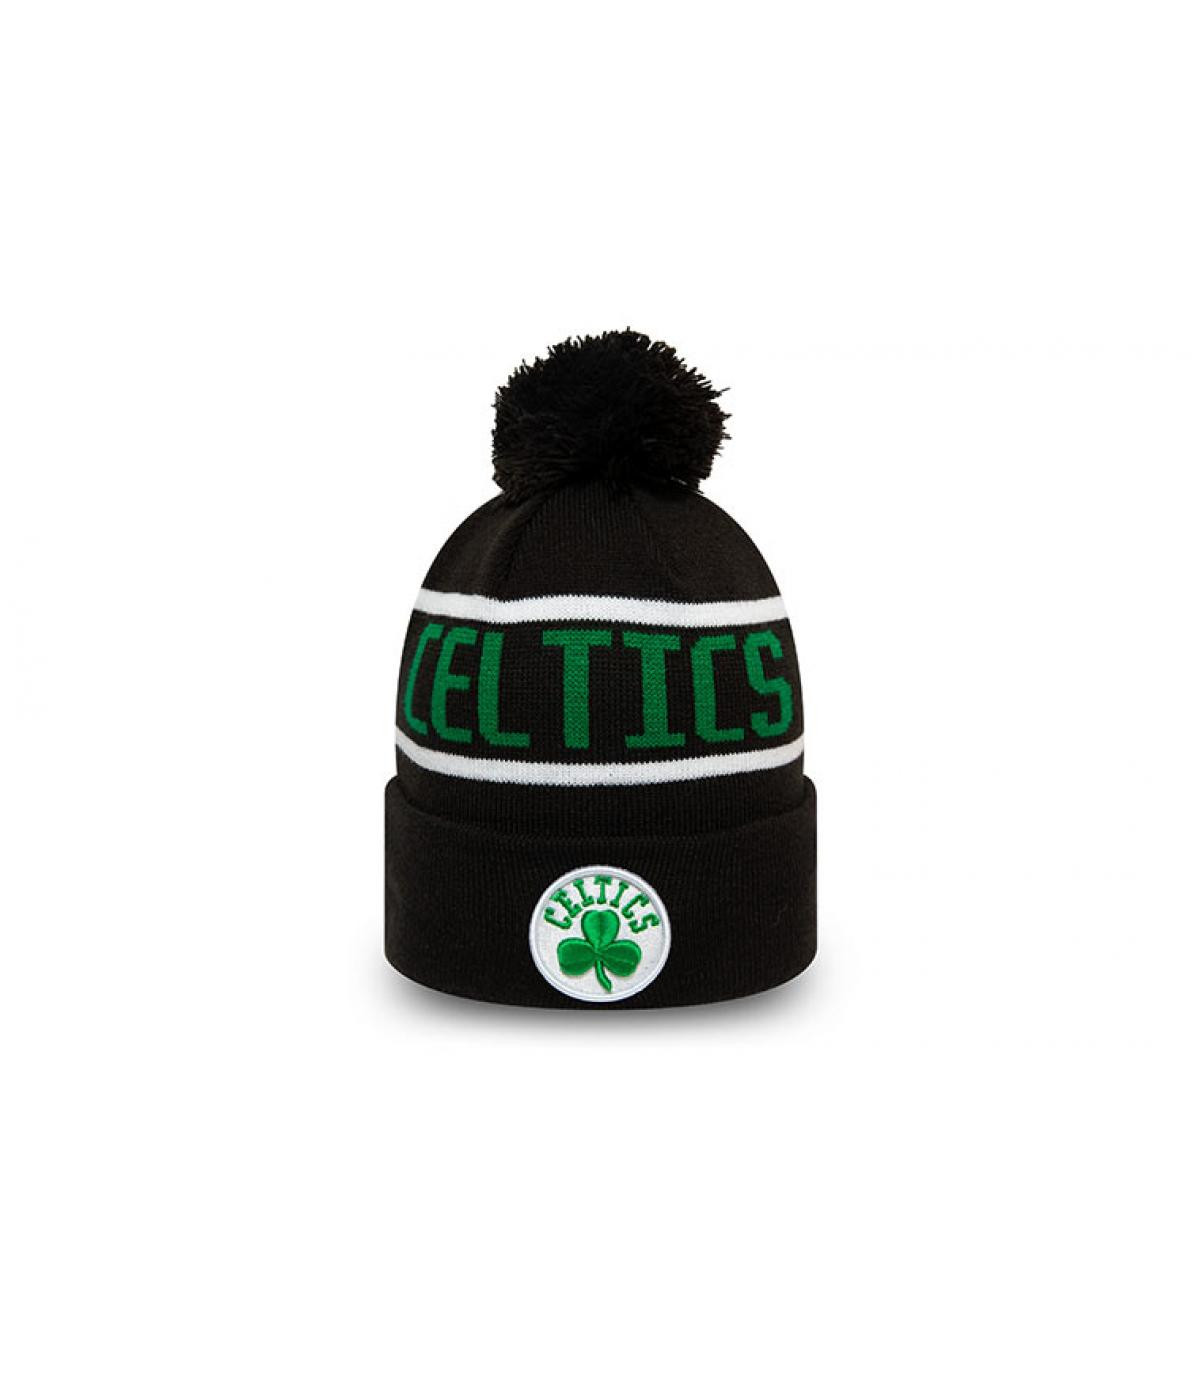 Detalles Bobble Knit Celtics imagen 2